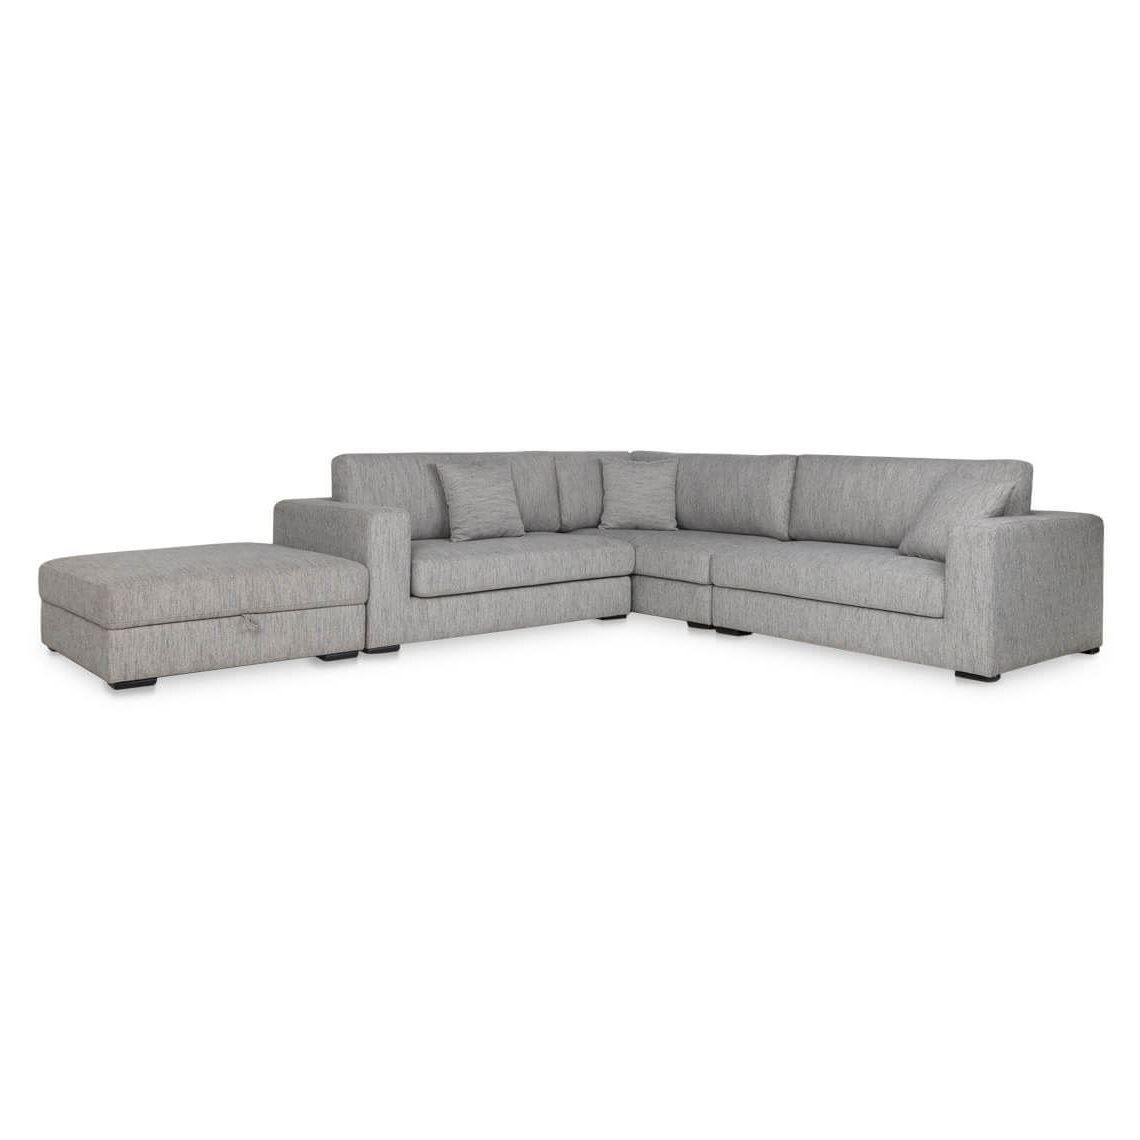 Aspect 6 Seat Fabric Modular Sofa With Left Mod Storage